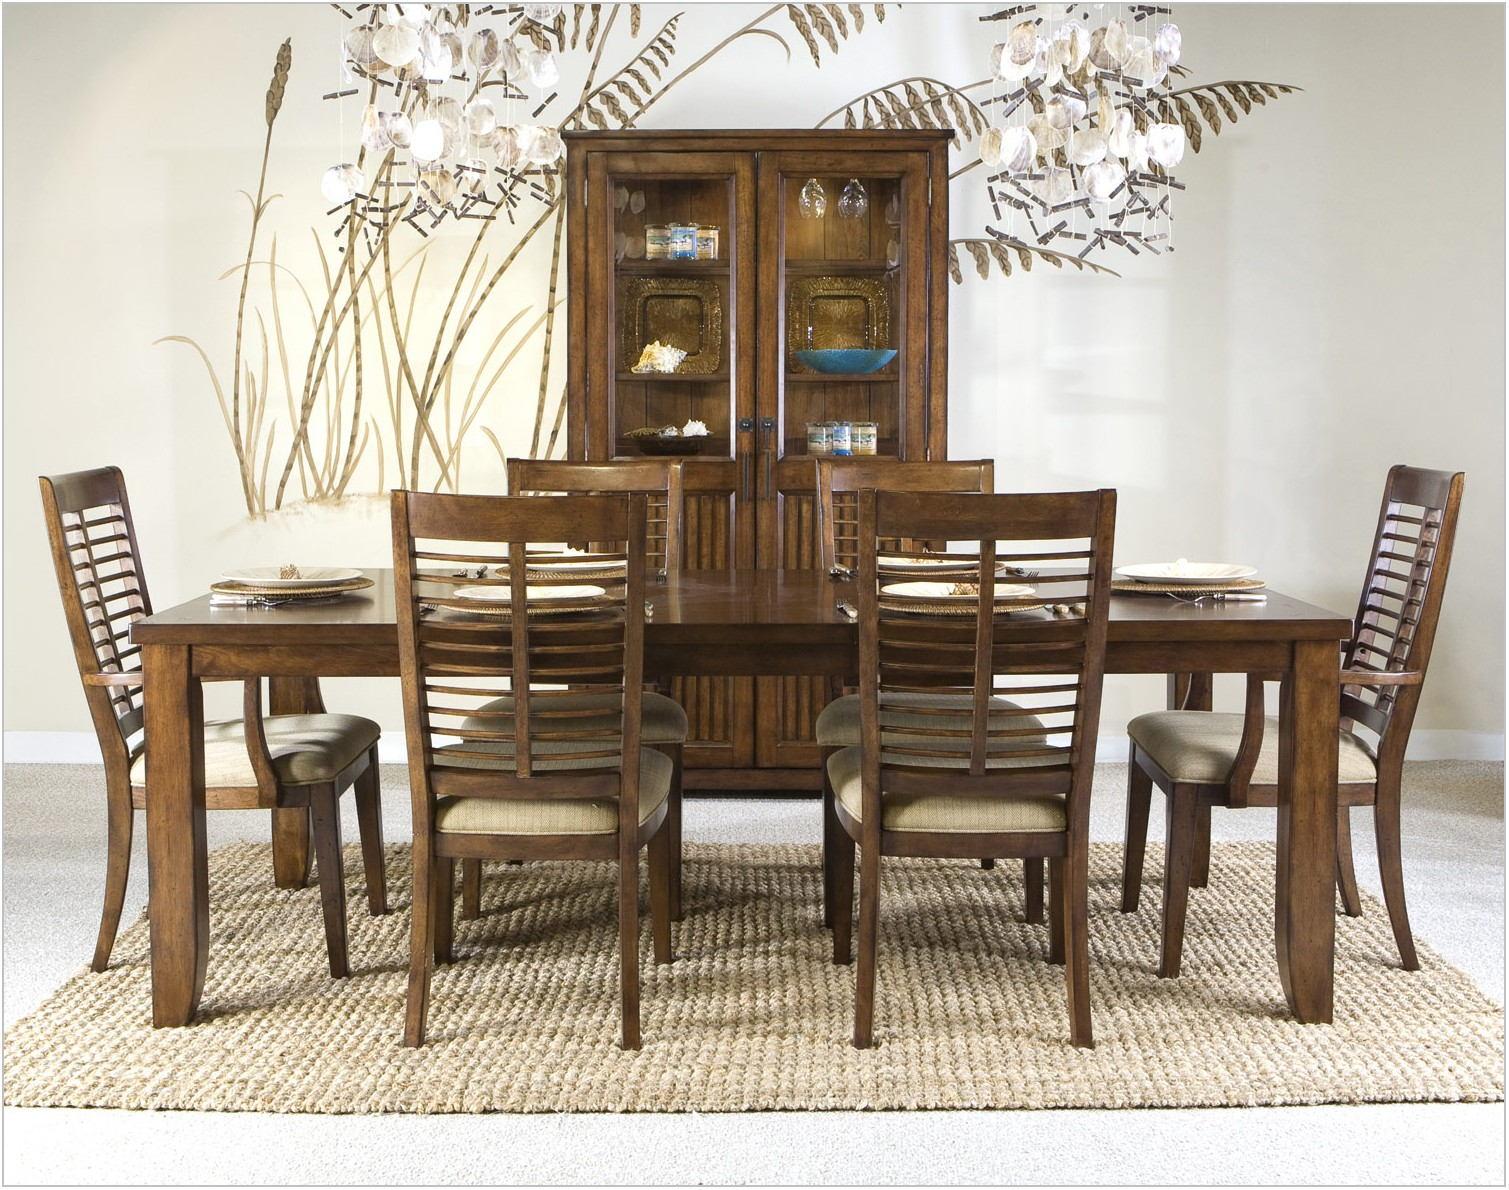 Union Jack Rug 8x10 Rugs Home Design Ideas Bqk93x9zlx